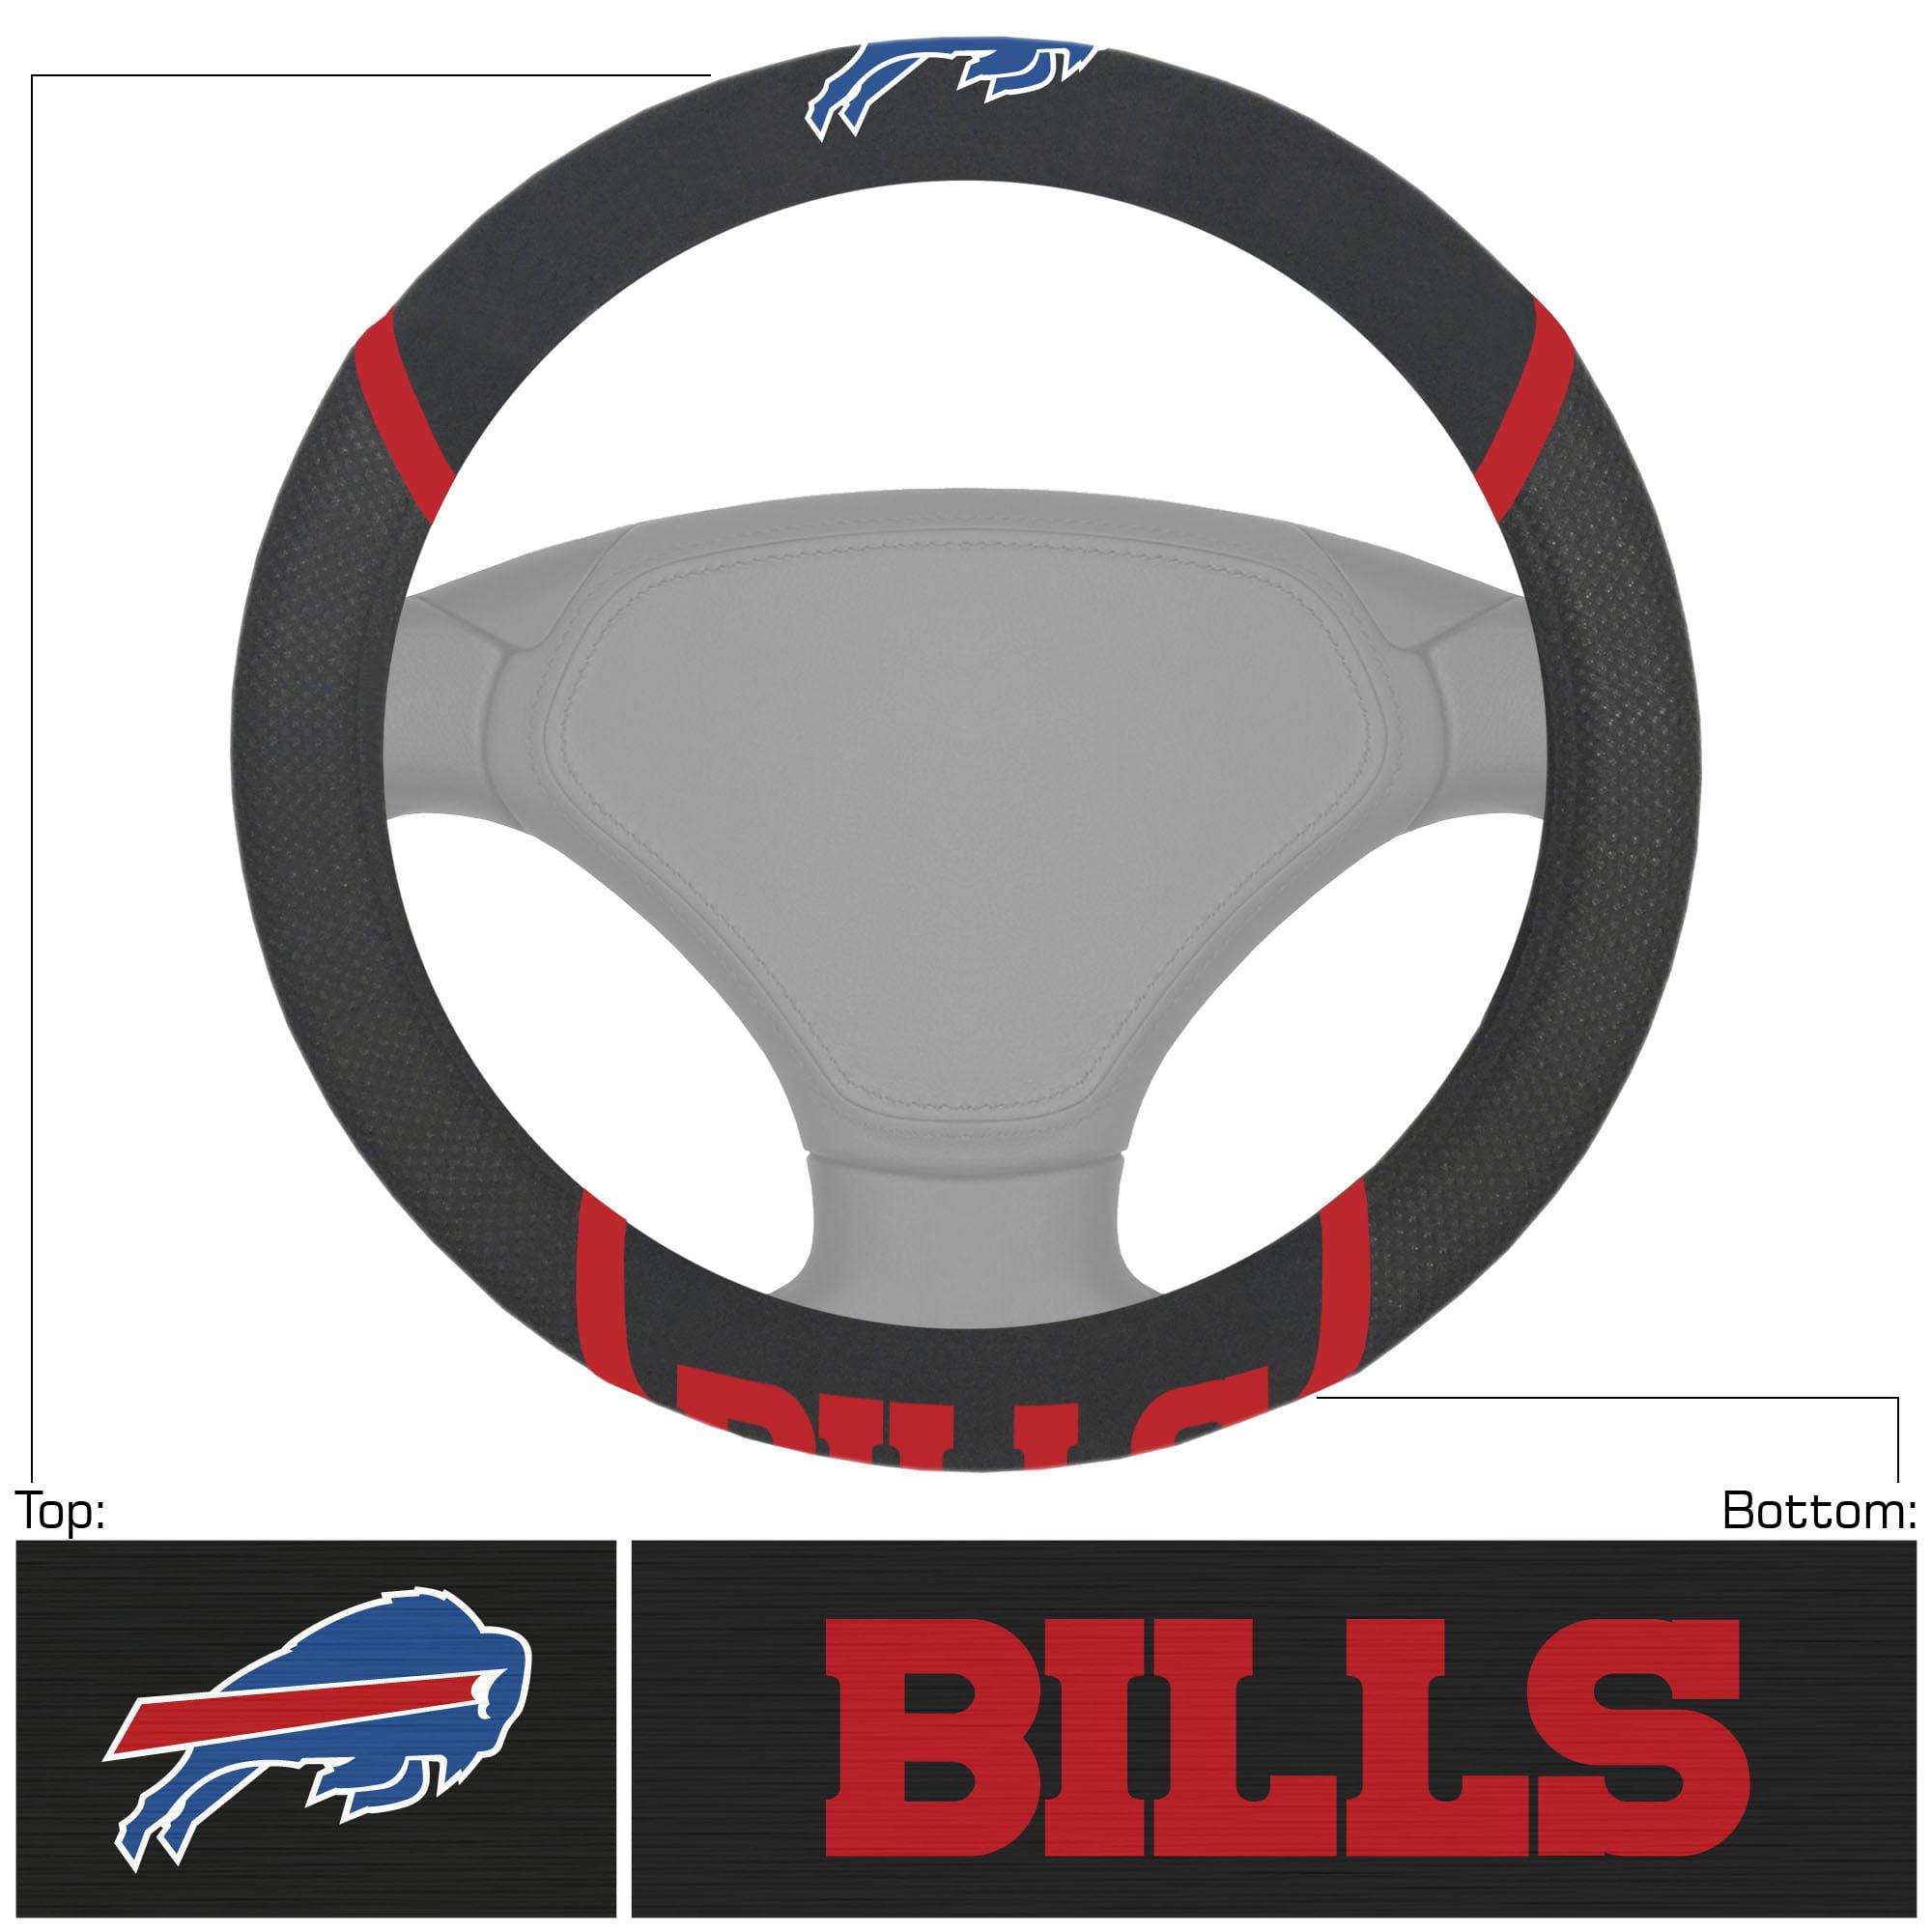 Buffalo Bills Logo & Wordmark Steering Wheel Cover - No Size